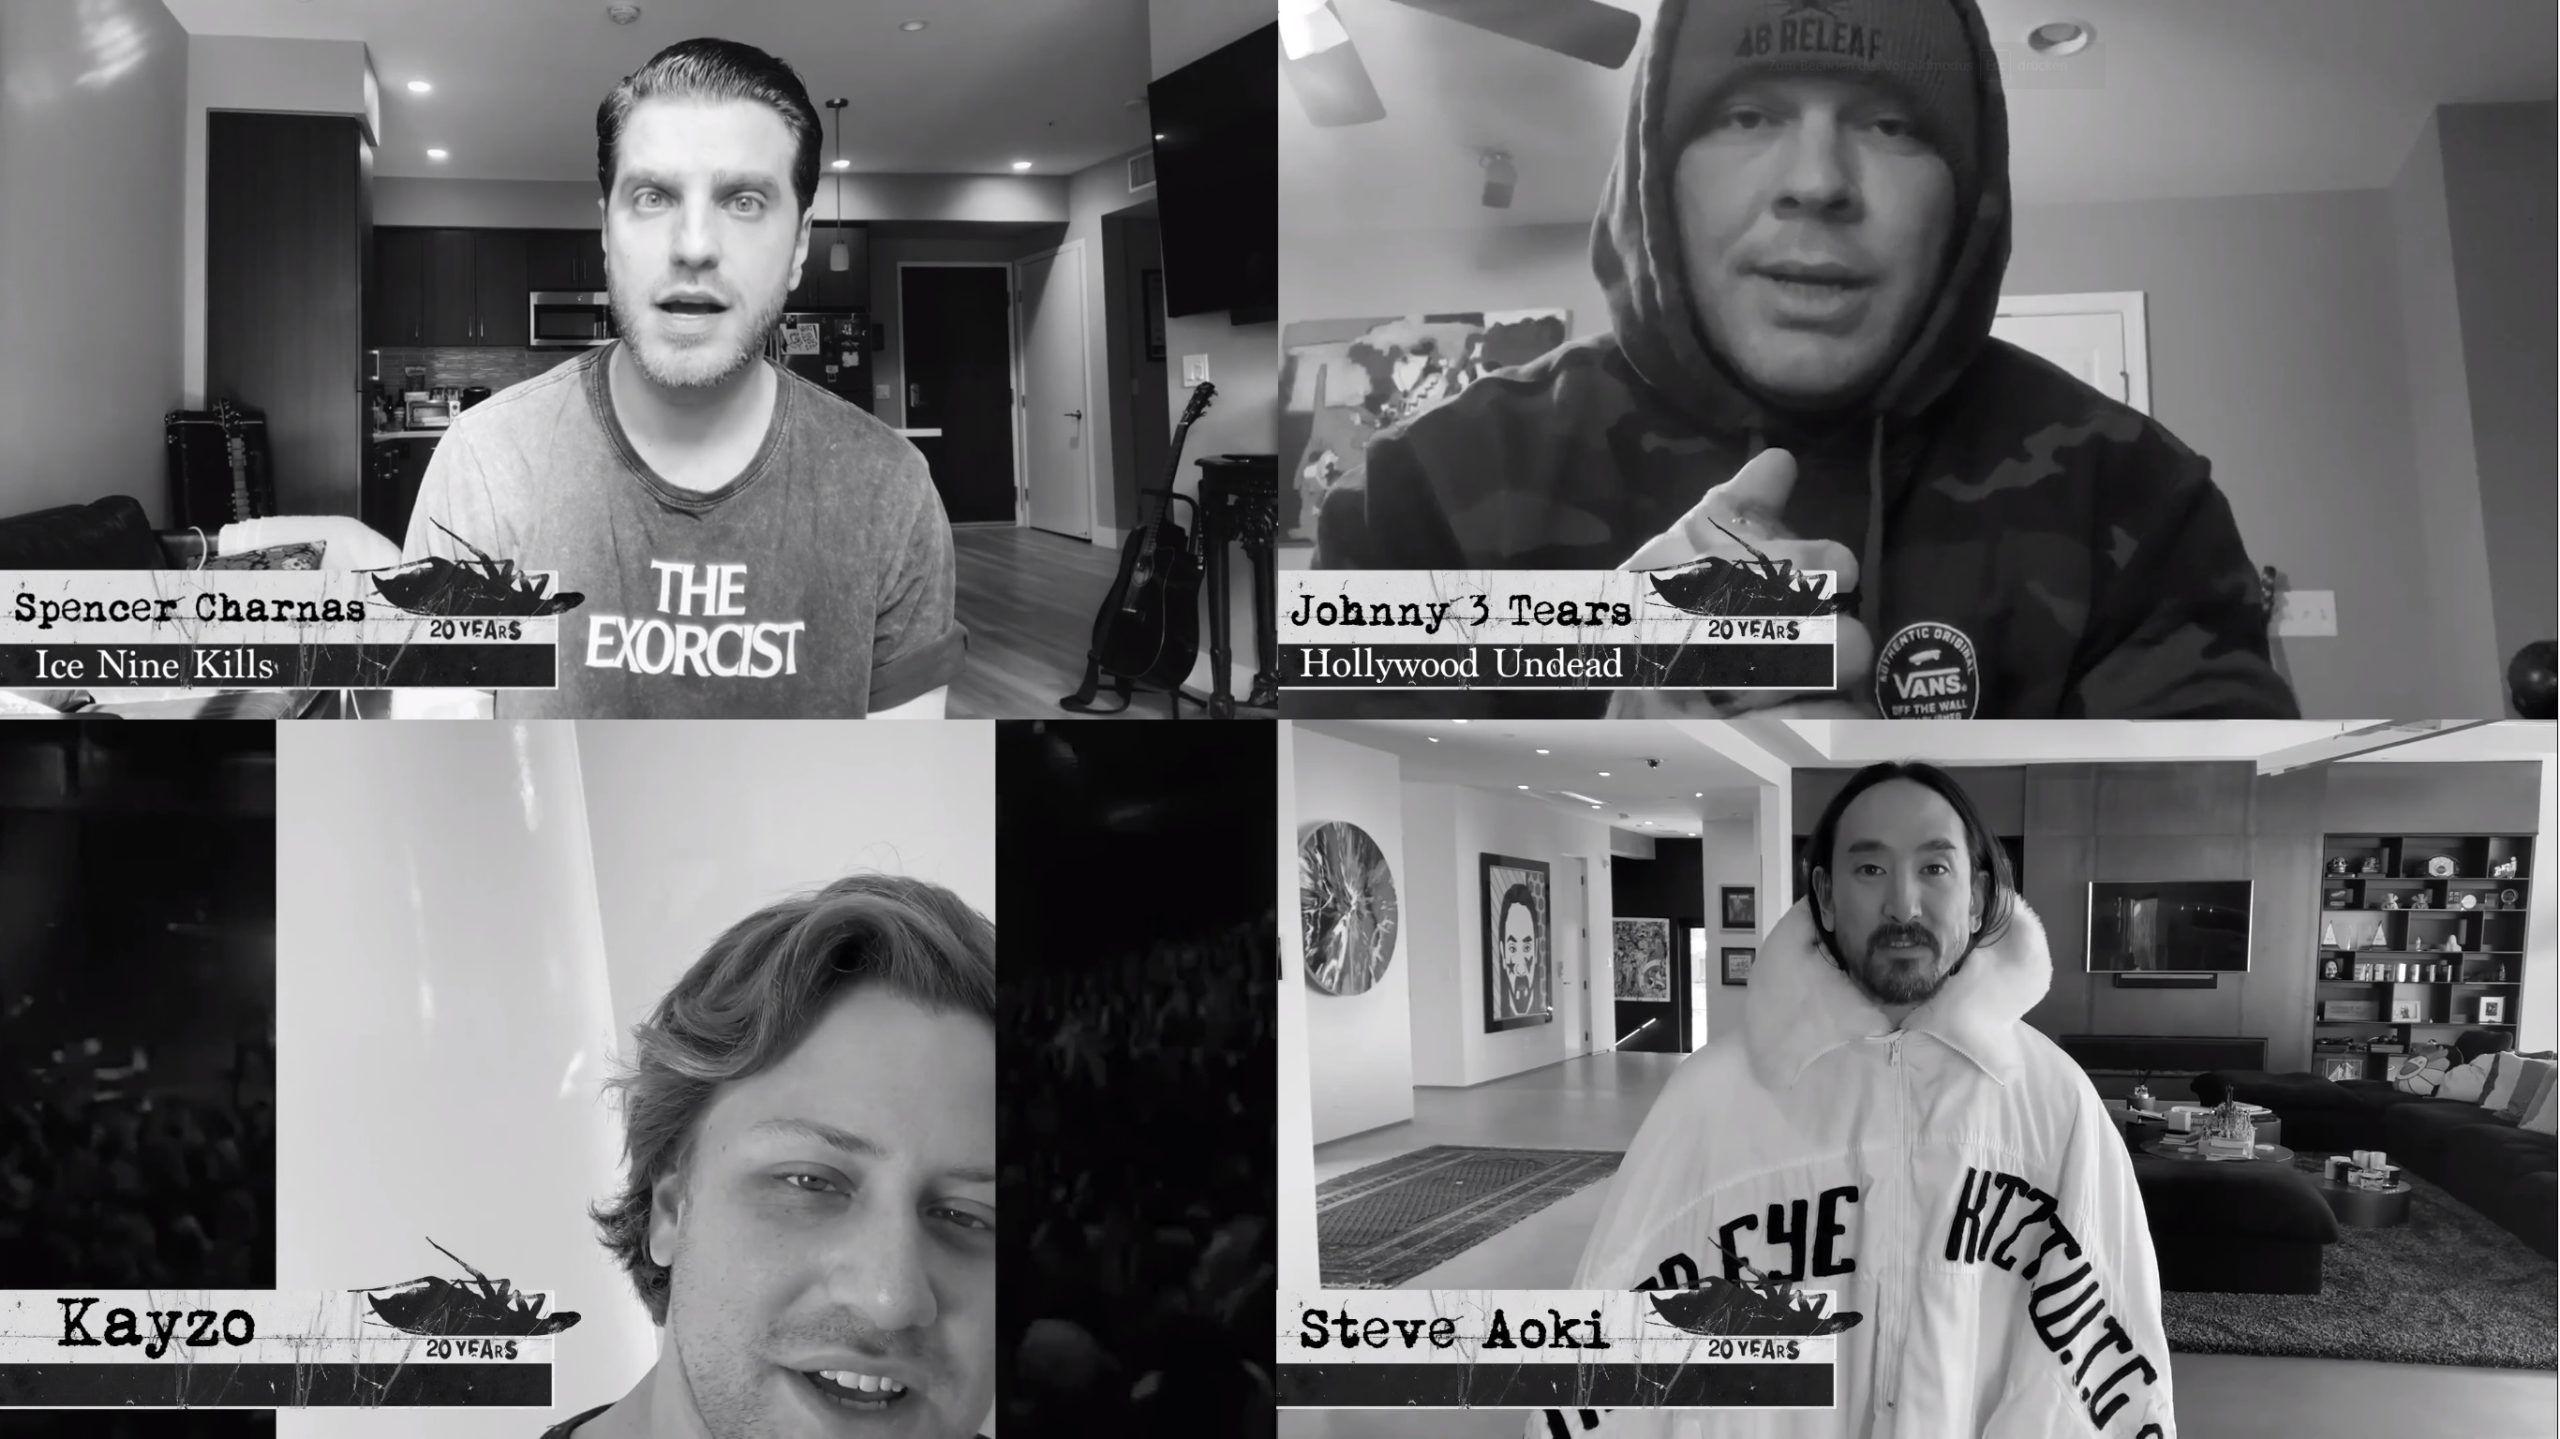 Papa Roach Ice Nine Kills Hollywood Undead Kayzo Steve Aoki